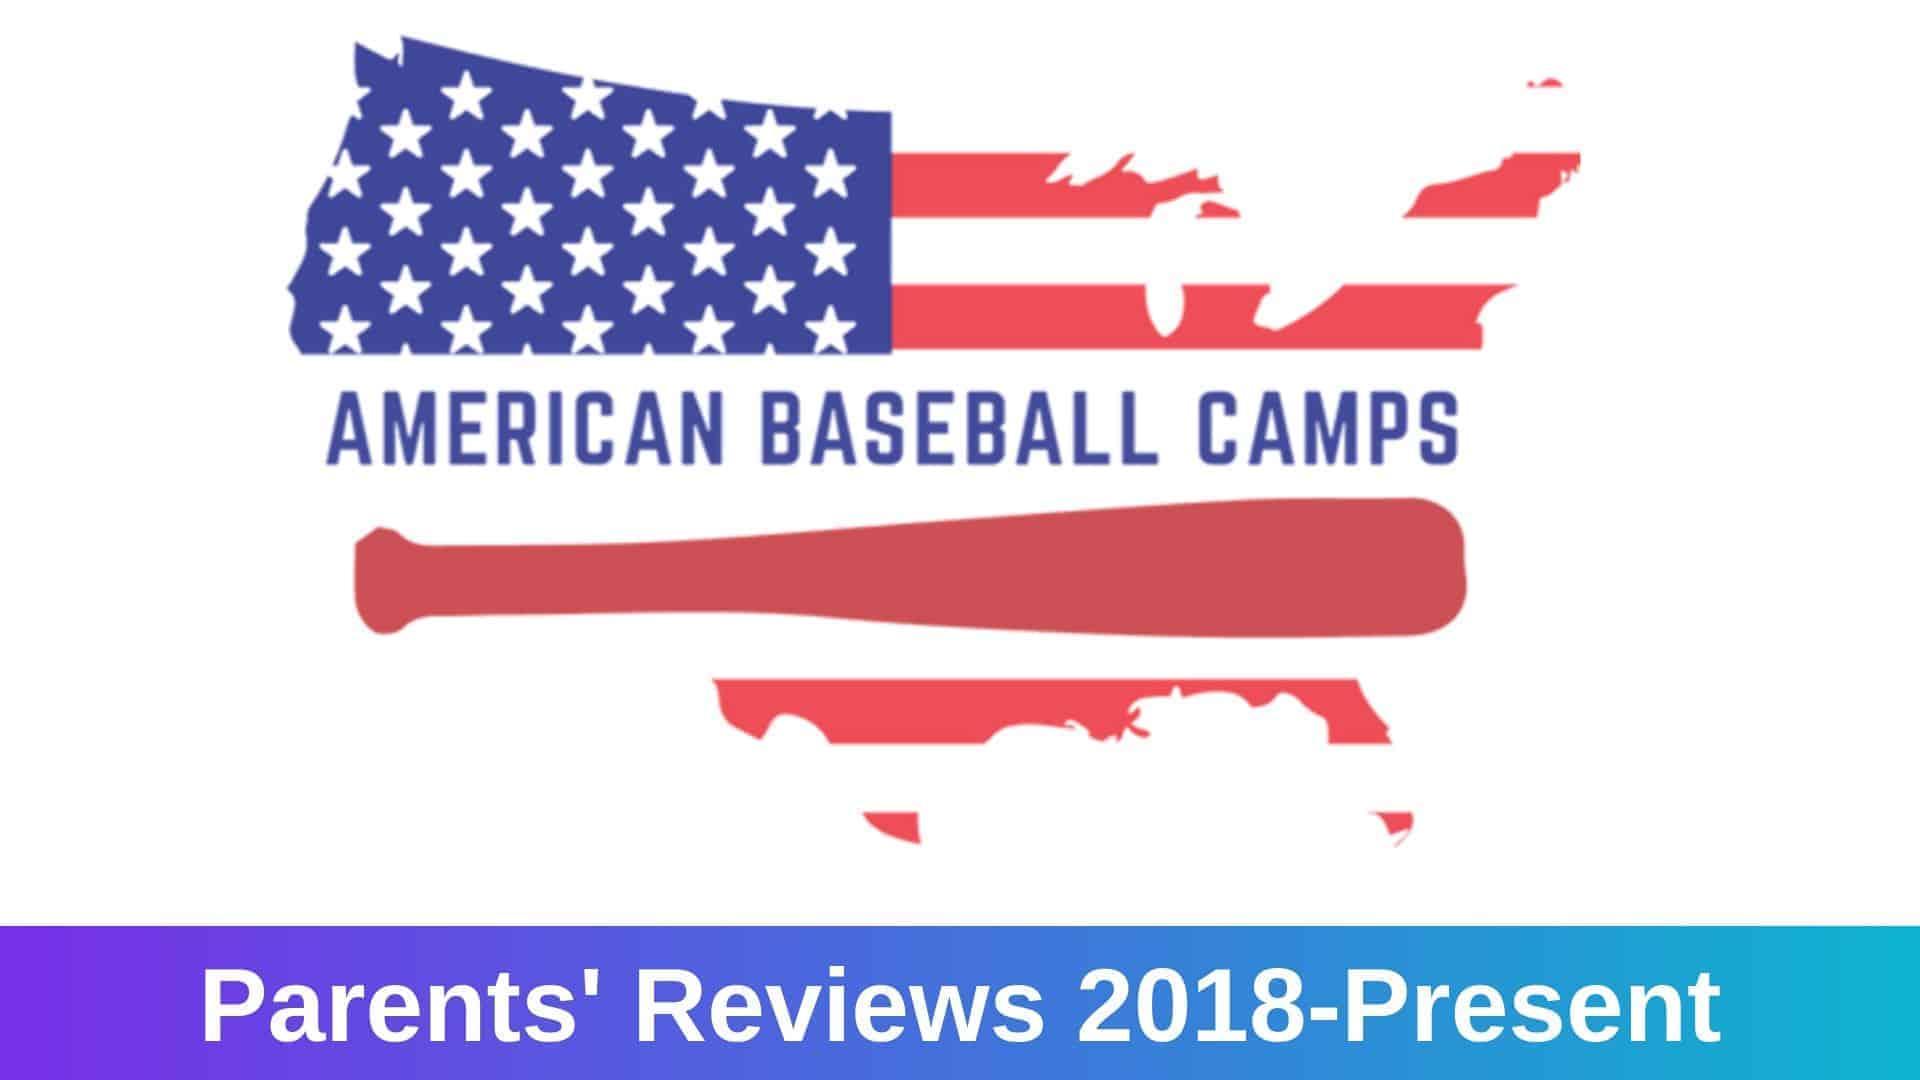 American Baseball Camps Reviews